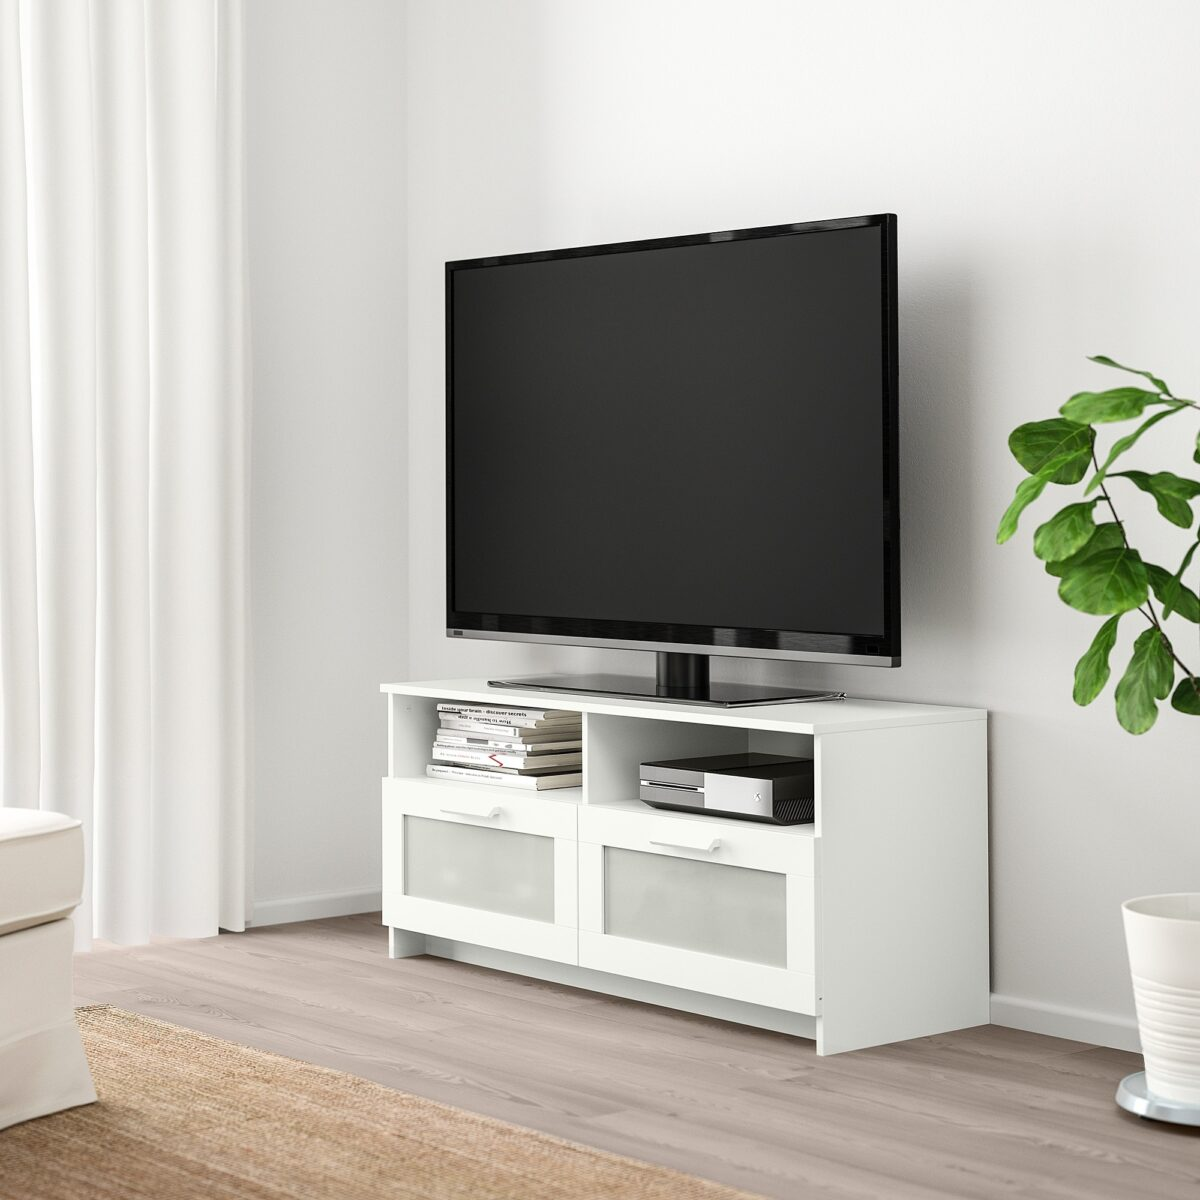 brimnes-mobile-tv-